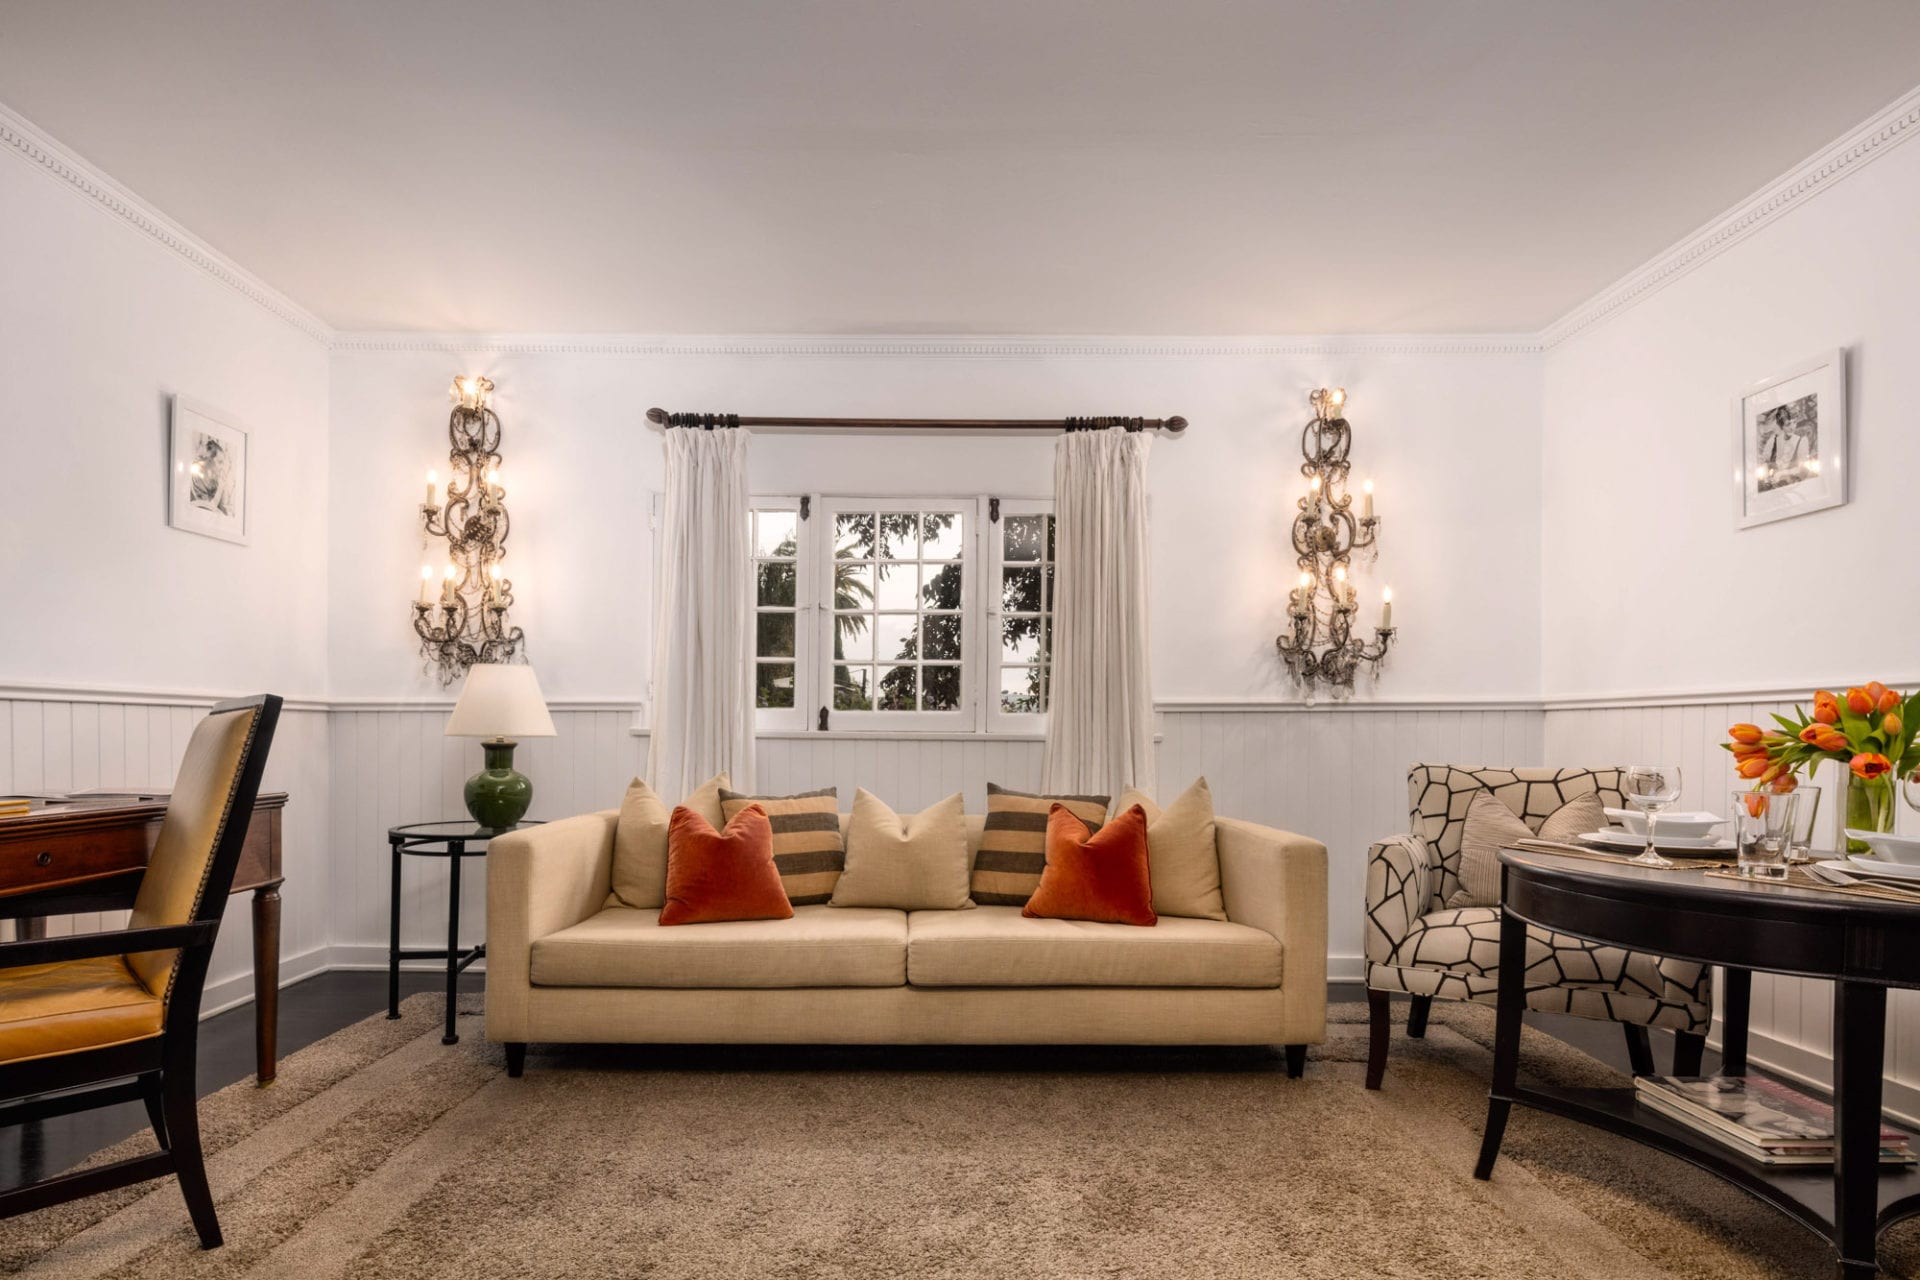 Betty Living room